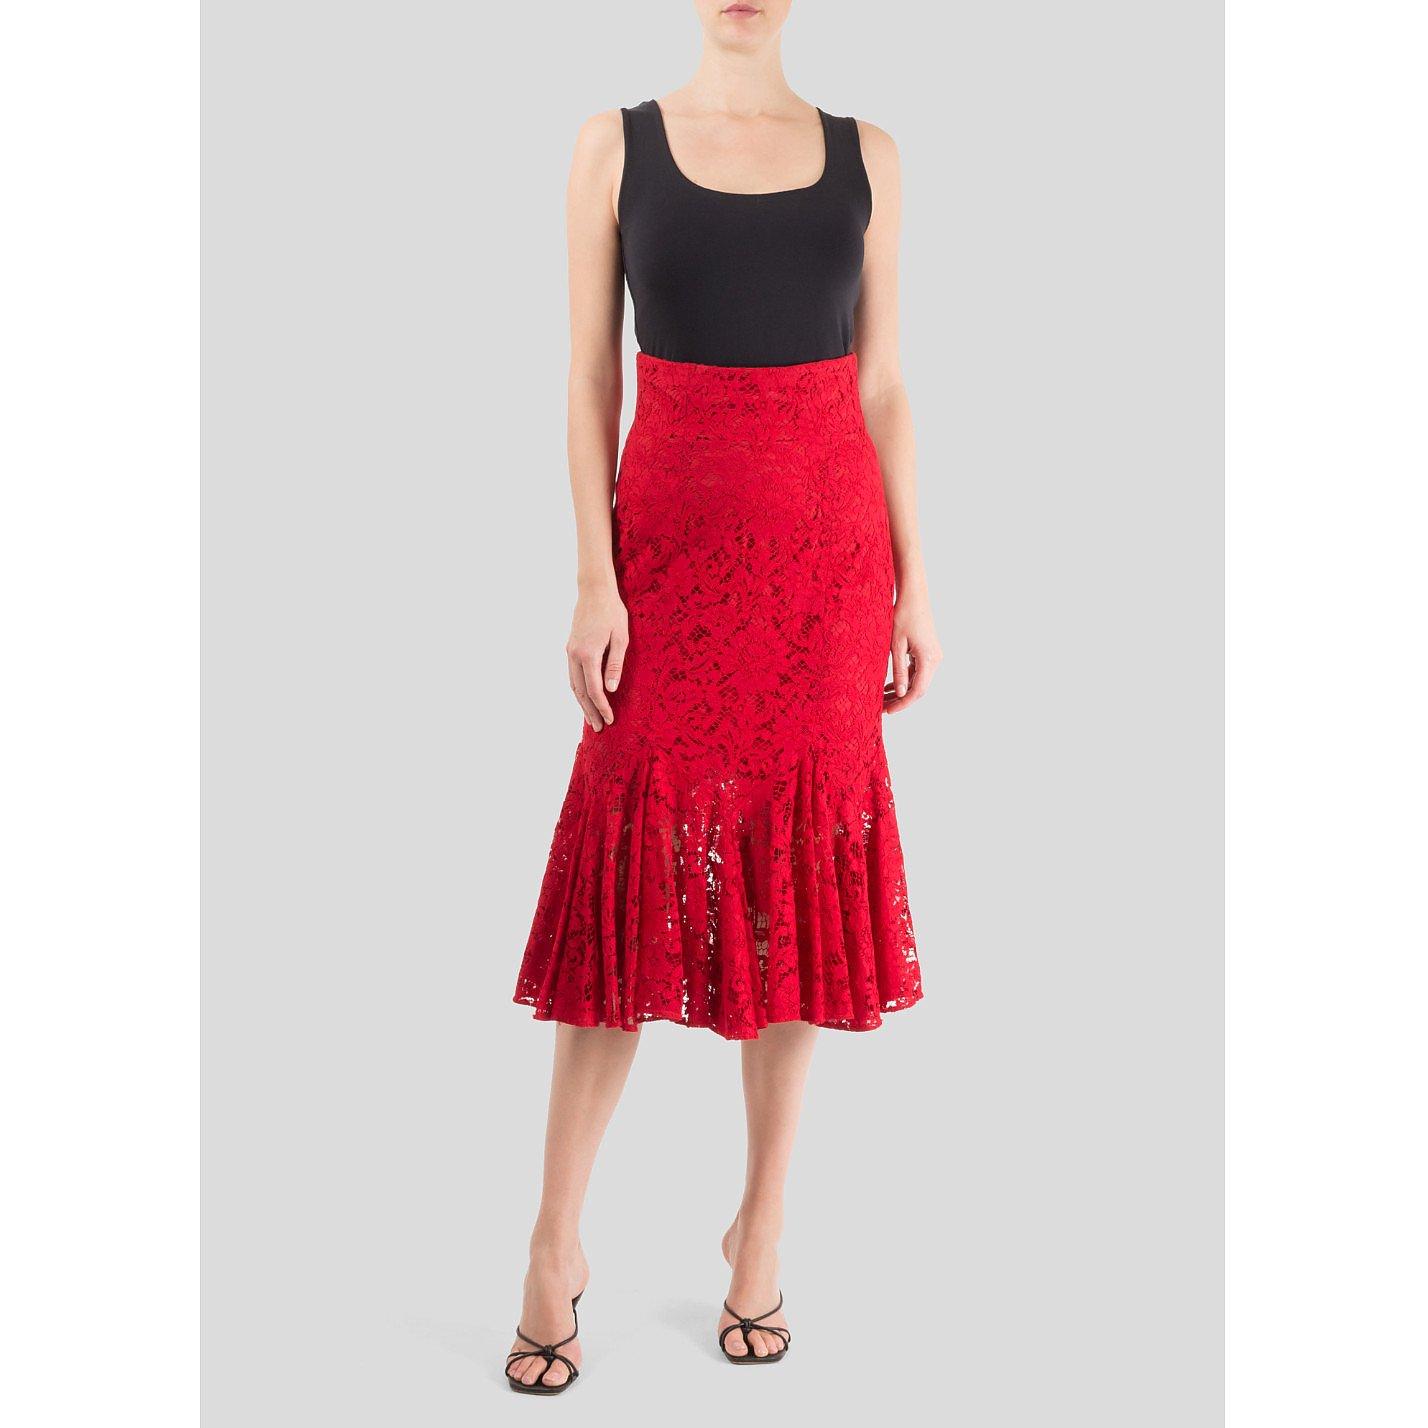 DOLCE & GABBANA Lace Fishtail Midi Skirt